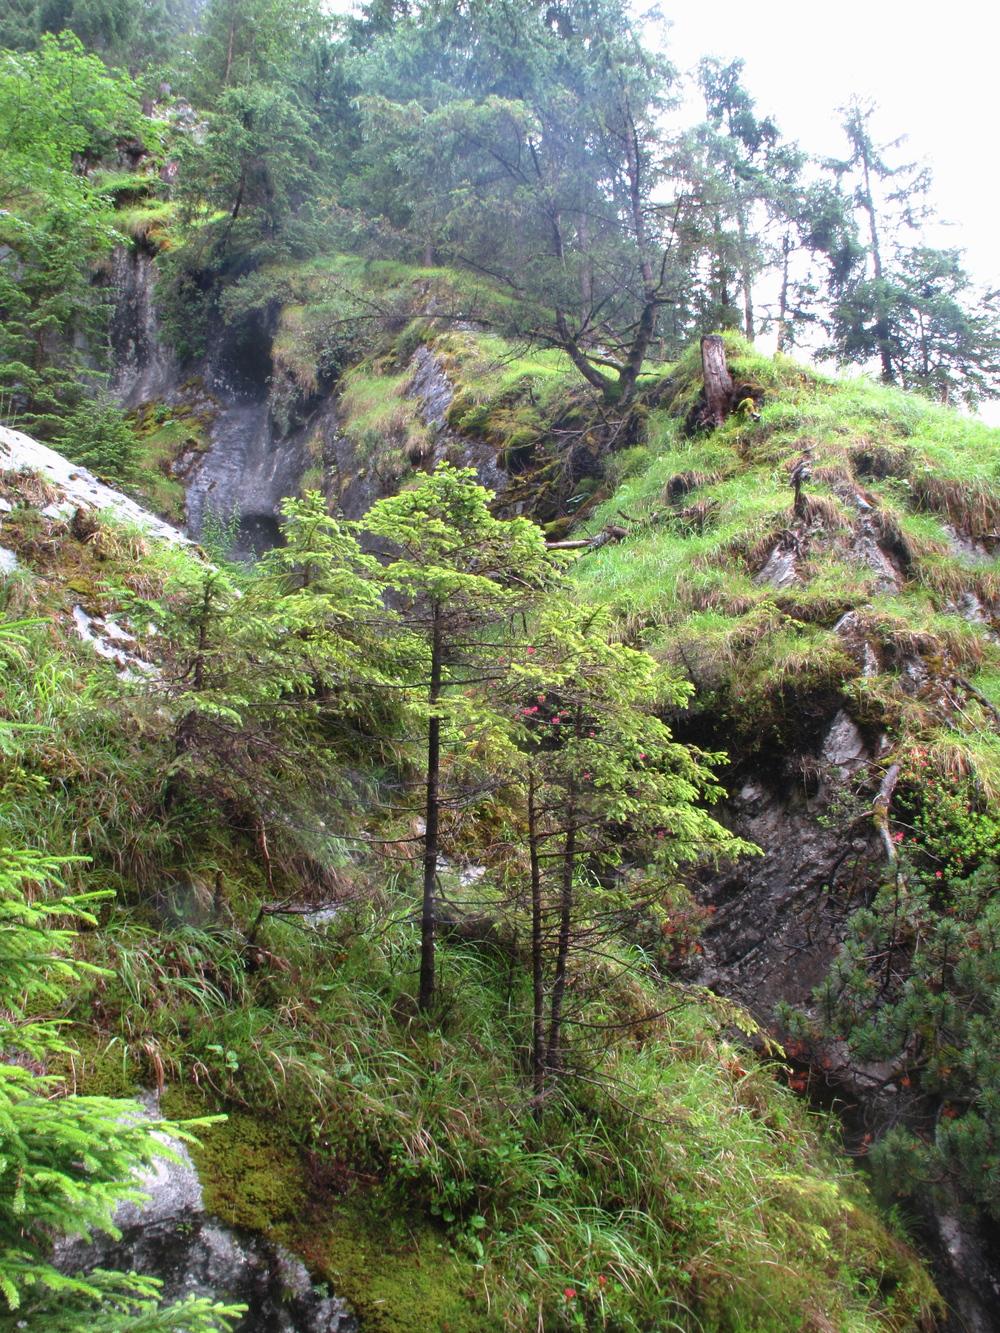 Small bonsai evergreen trees on the mountains of Lauterbrunnen valley switzerland.